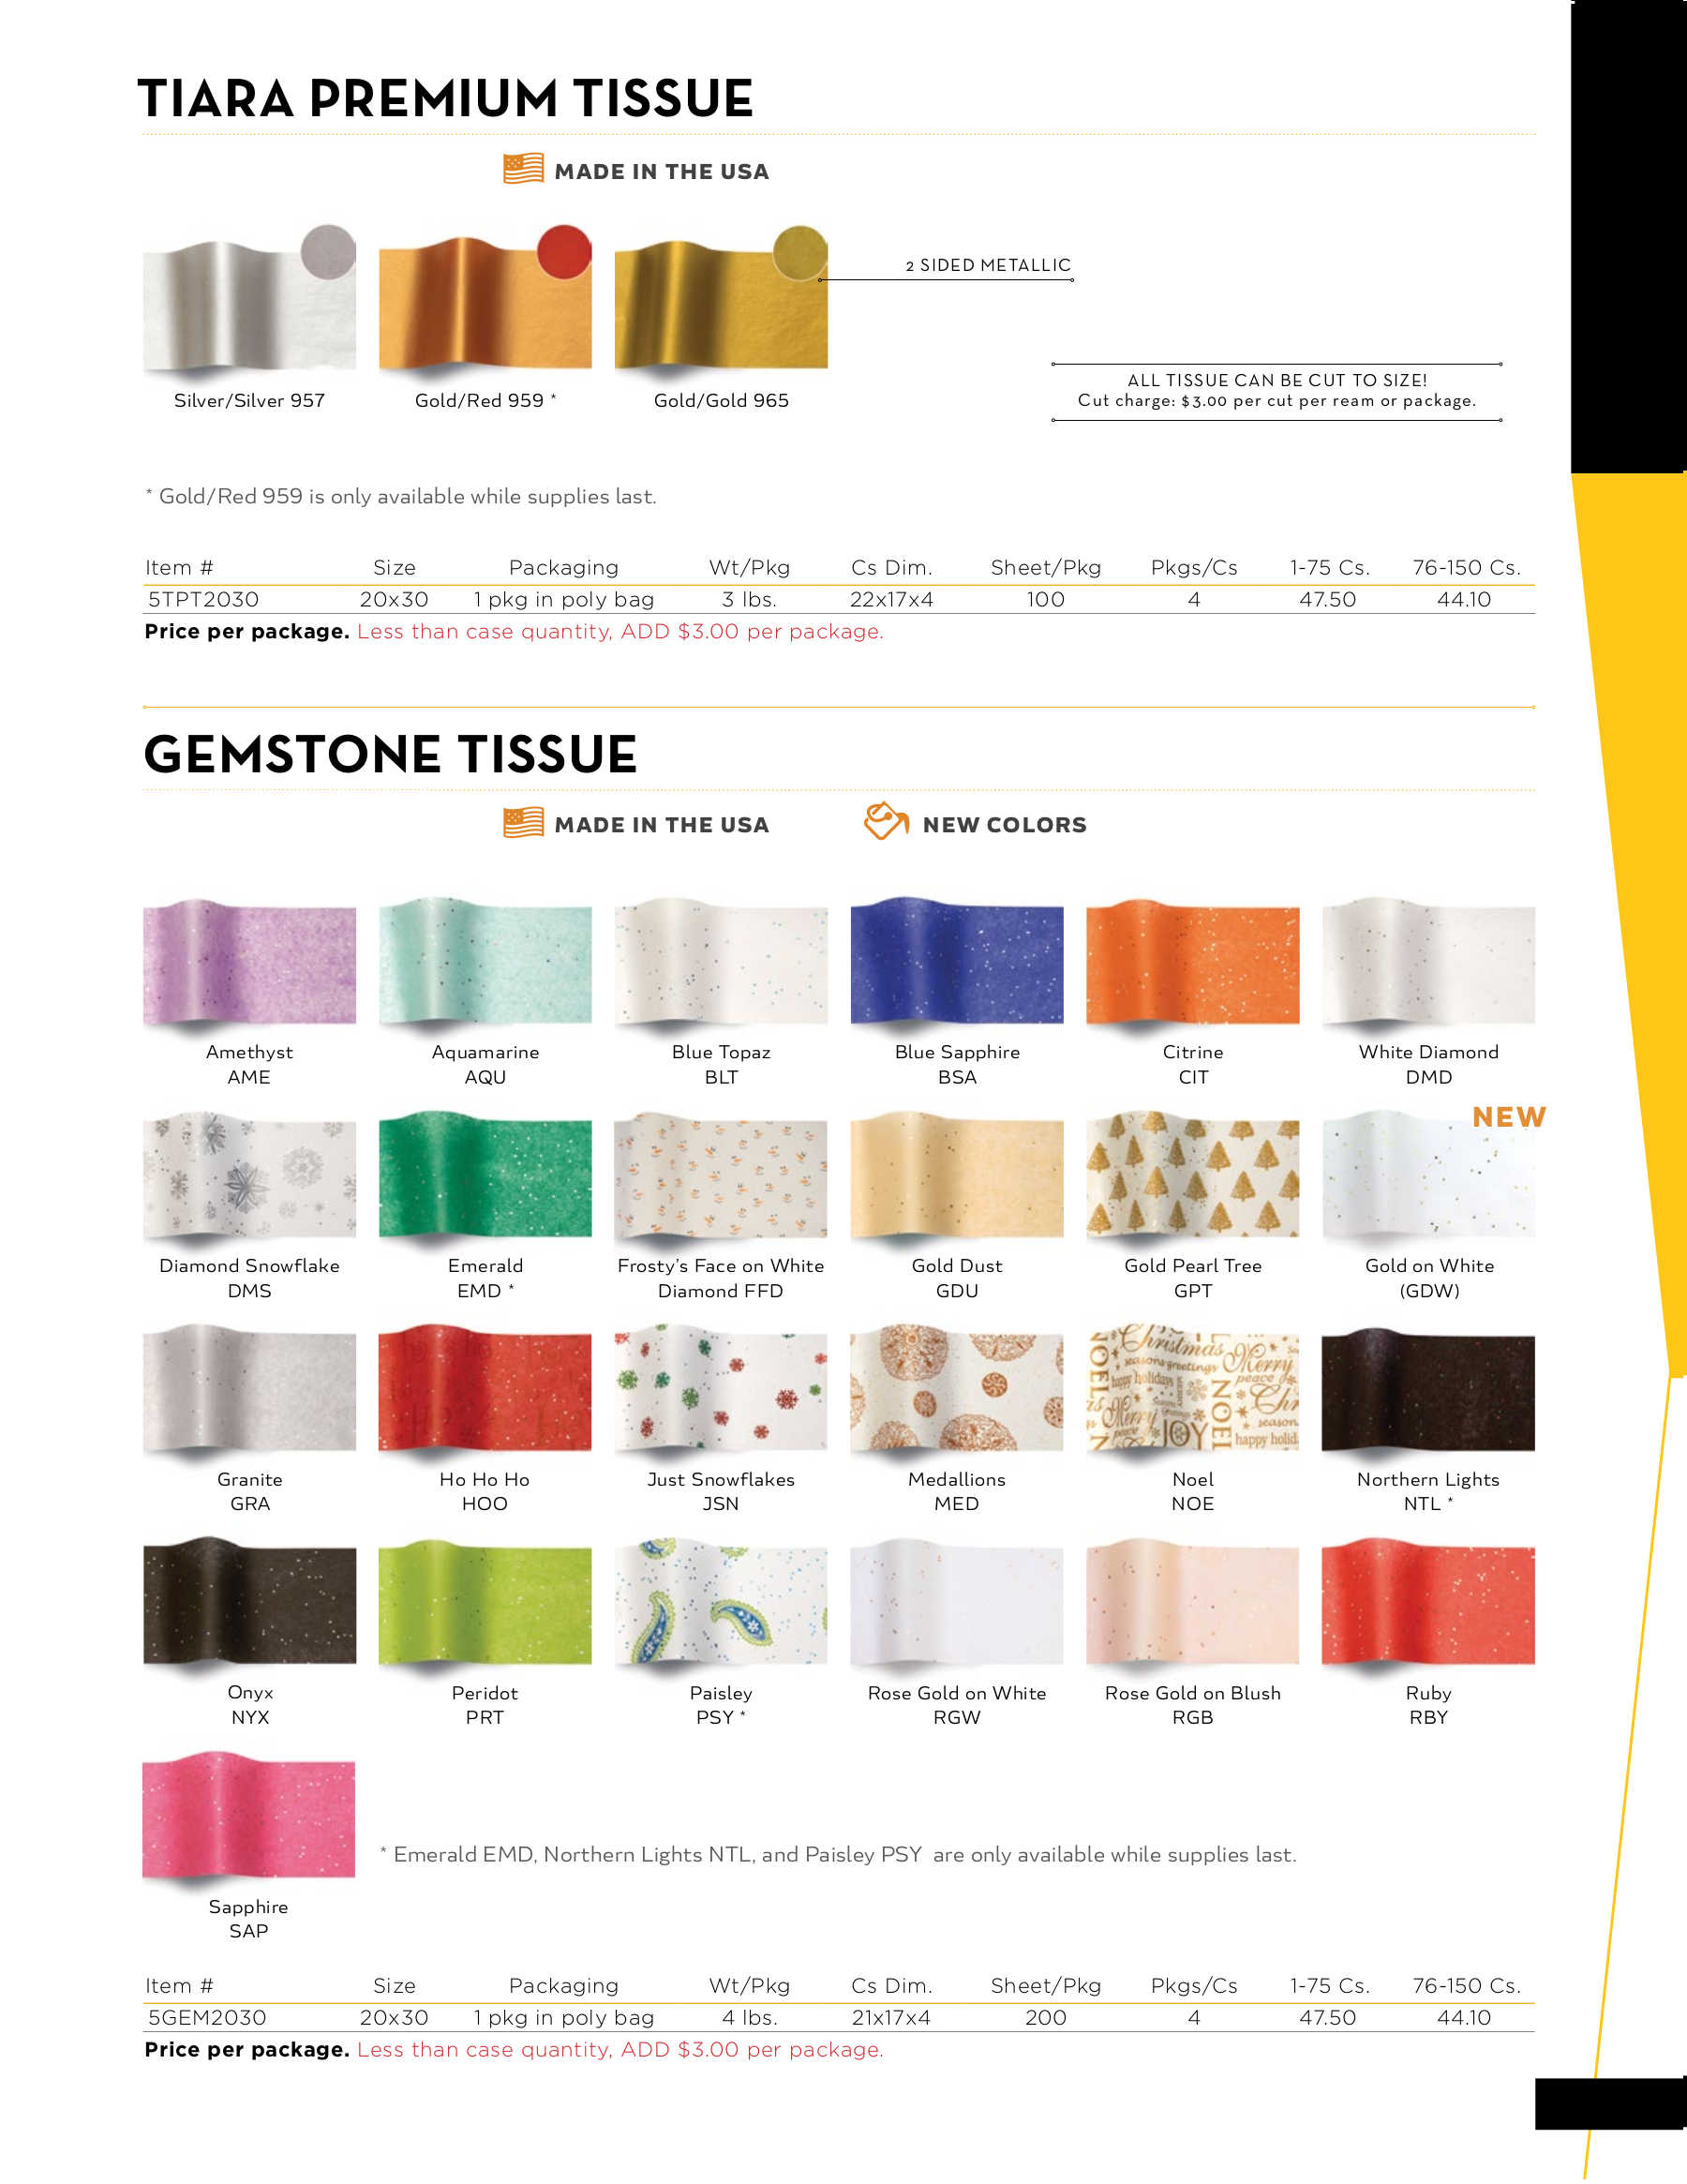 Tiara and Gemstone Tissue